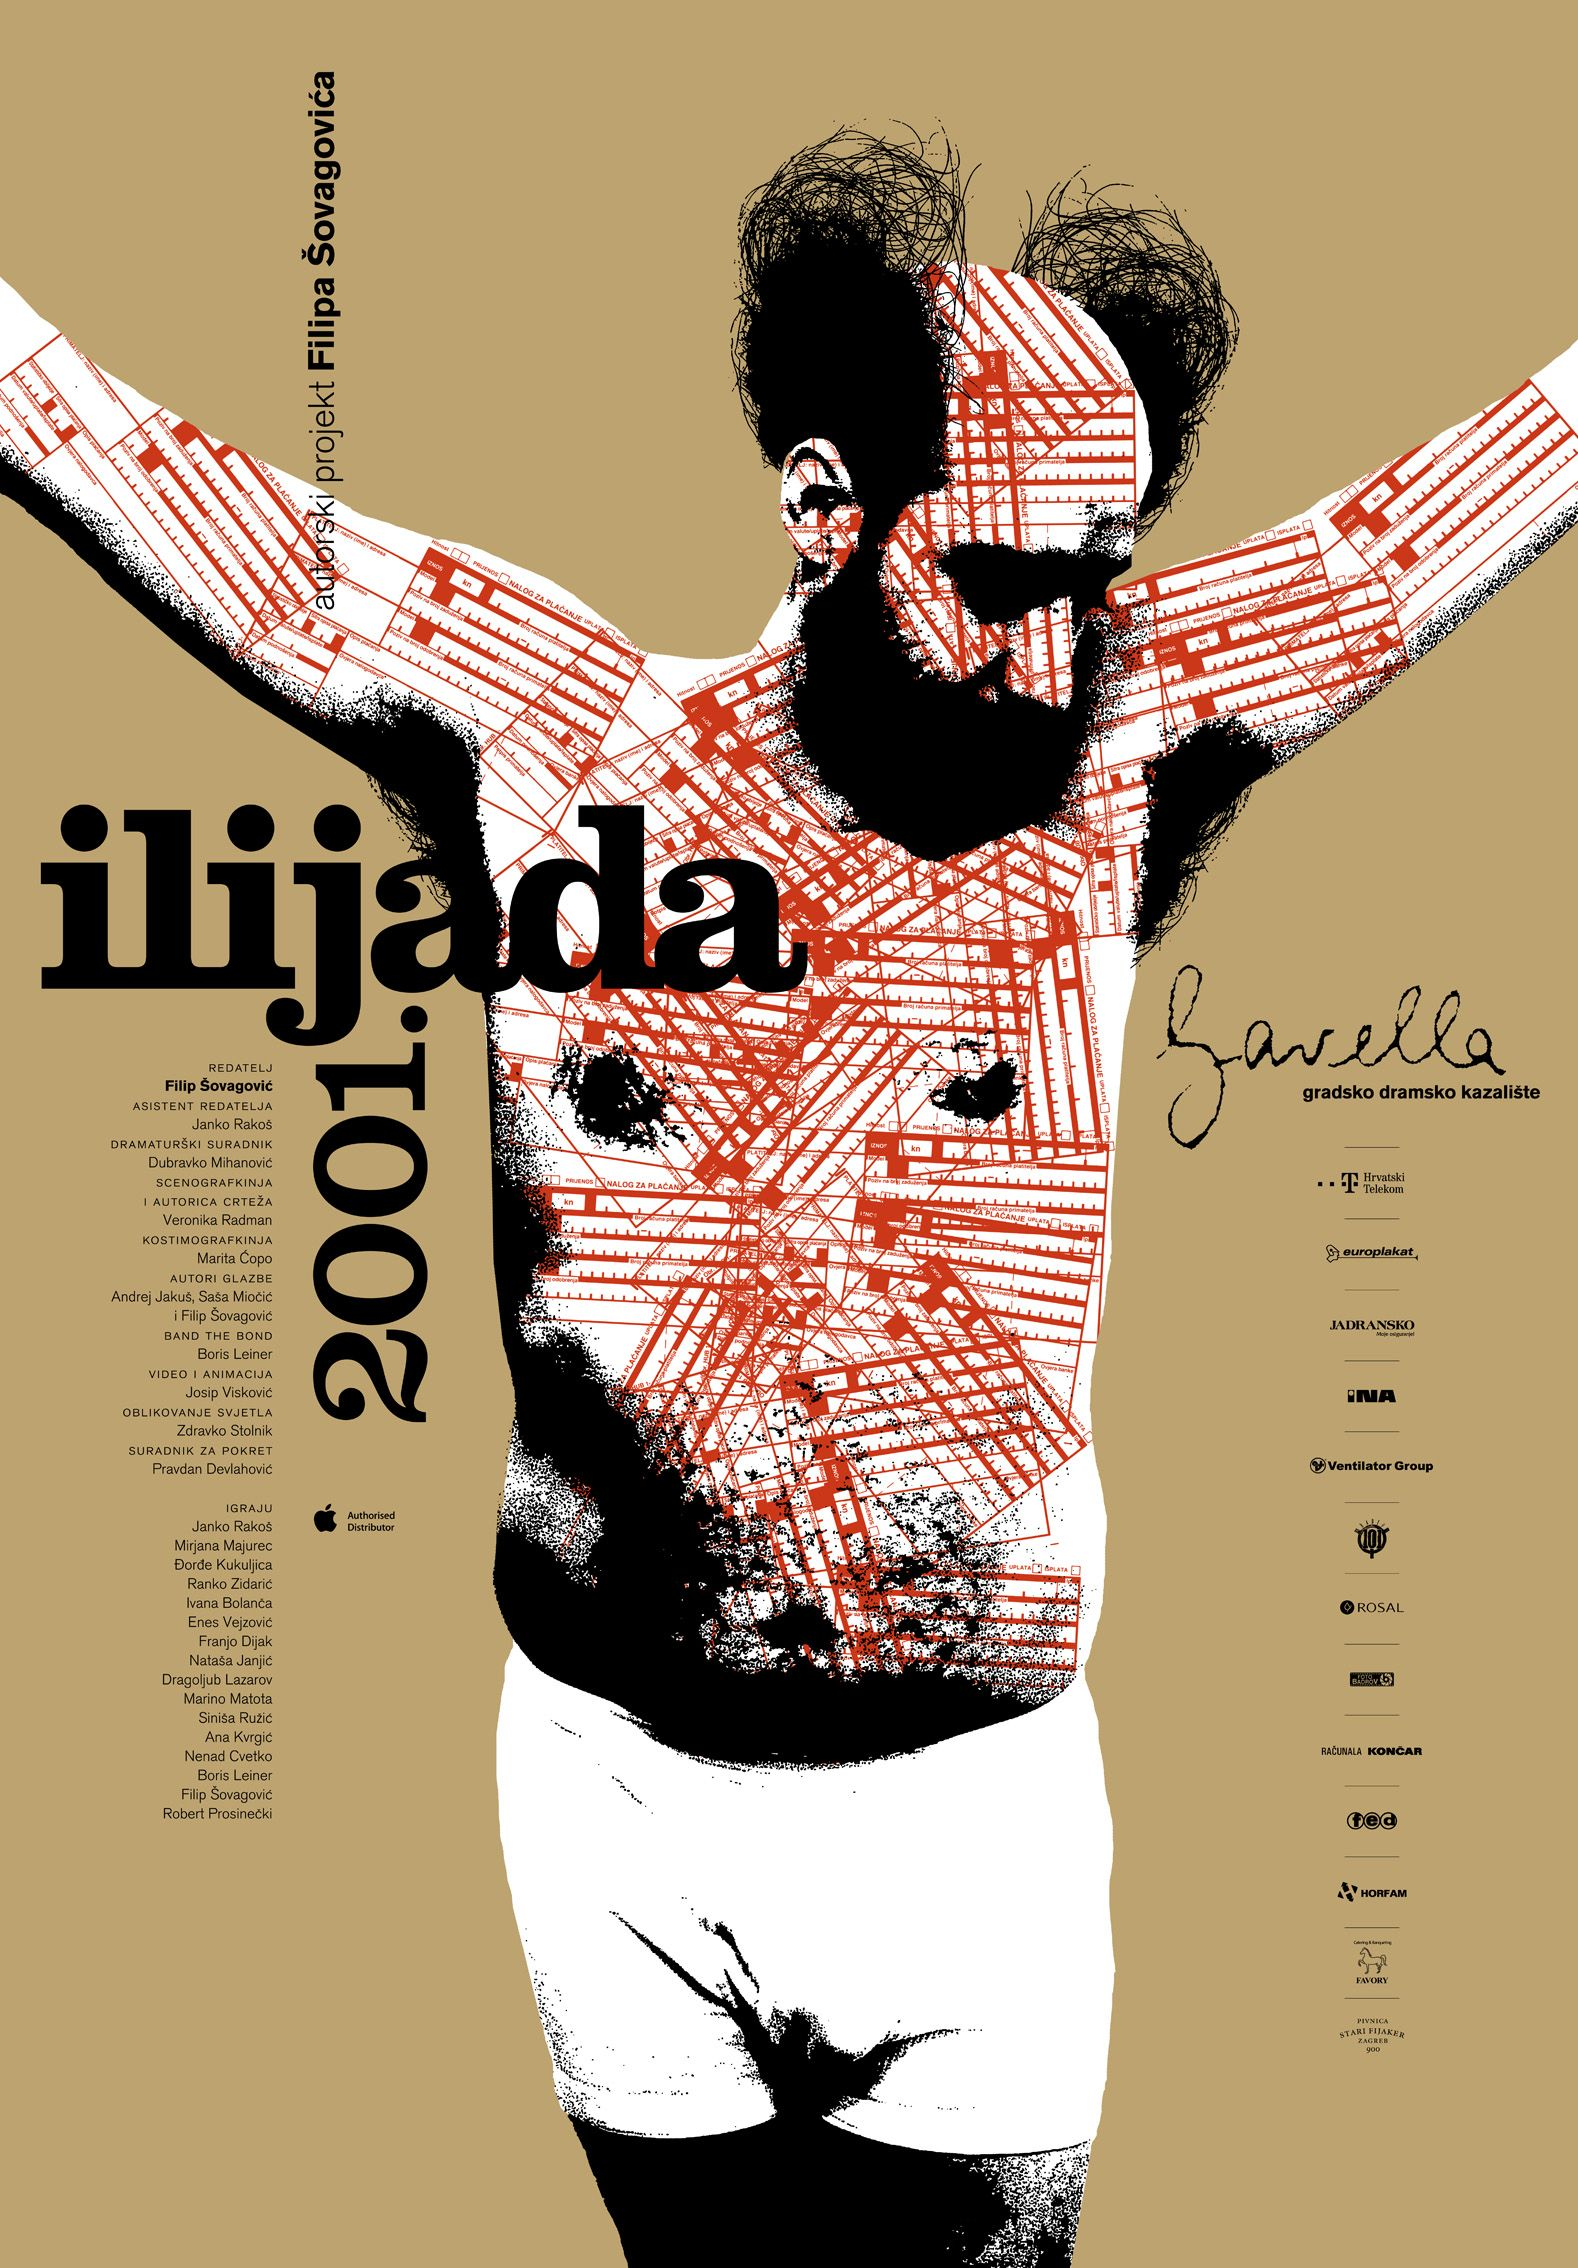 Iliad 2001 by Filip Šovagović. Theatre poster design by Vanja Cuculić/Studio Cuculić for Gavella Theatre.